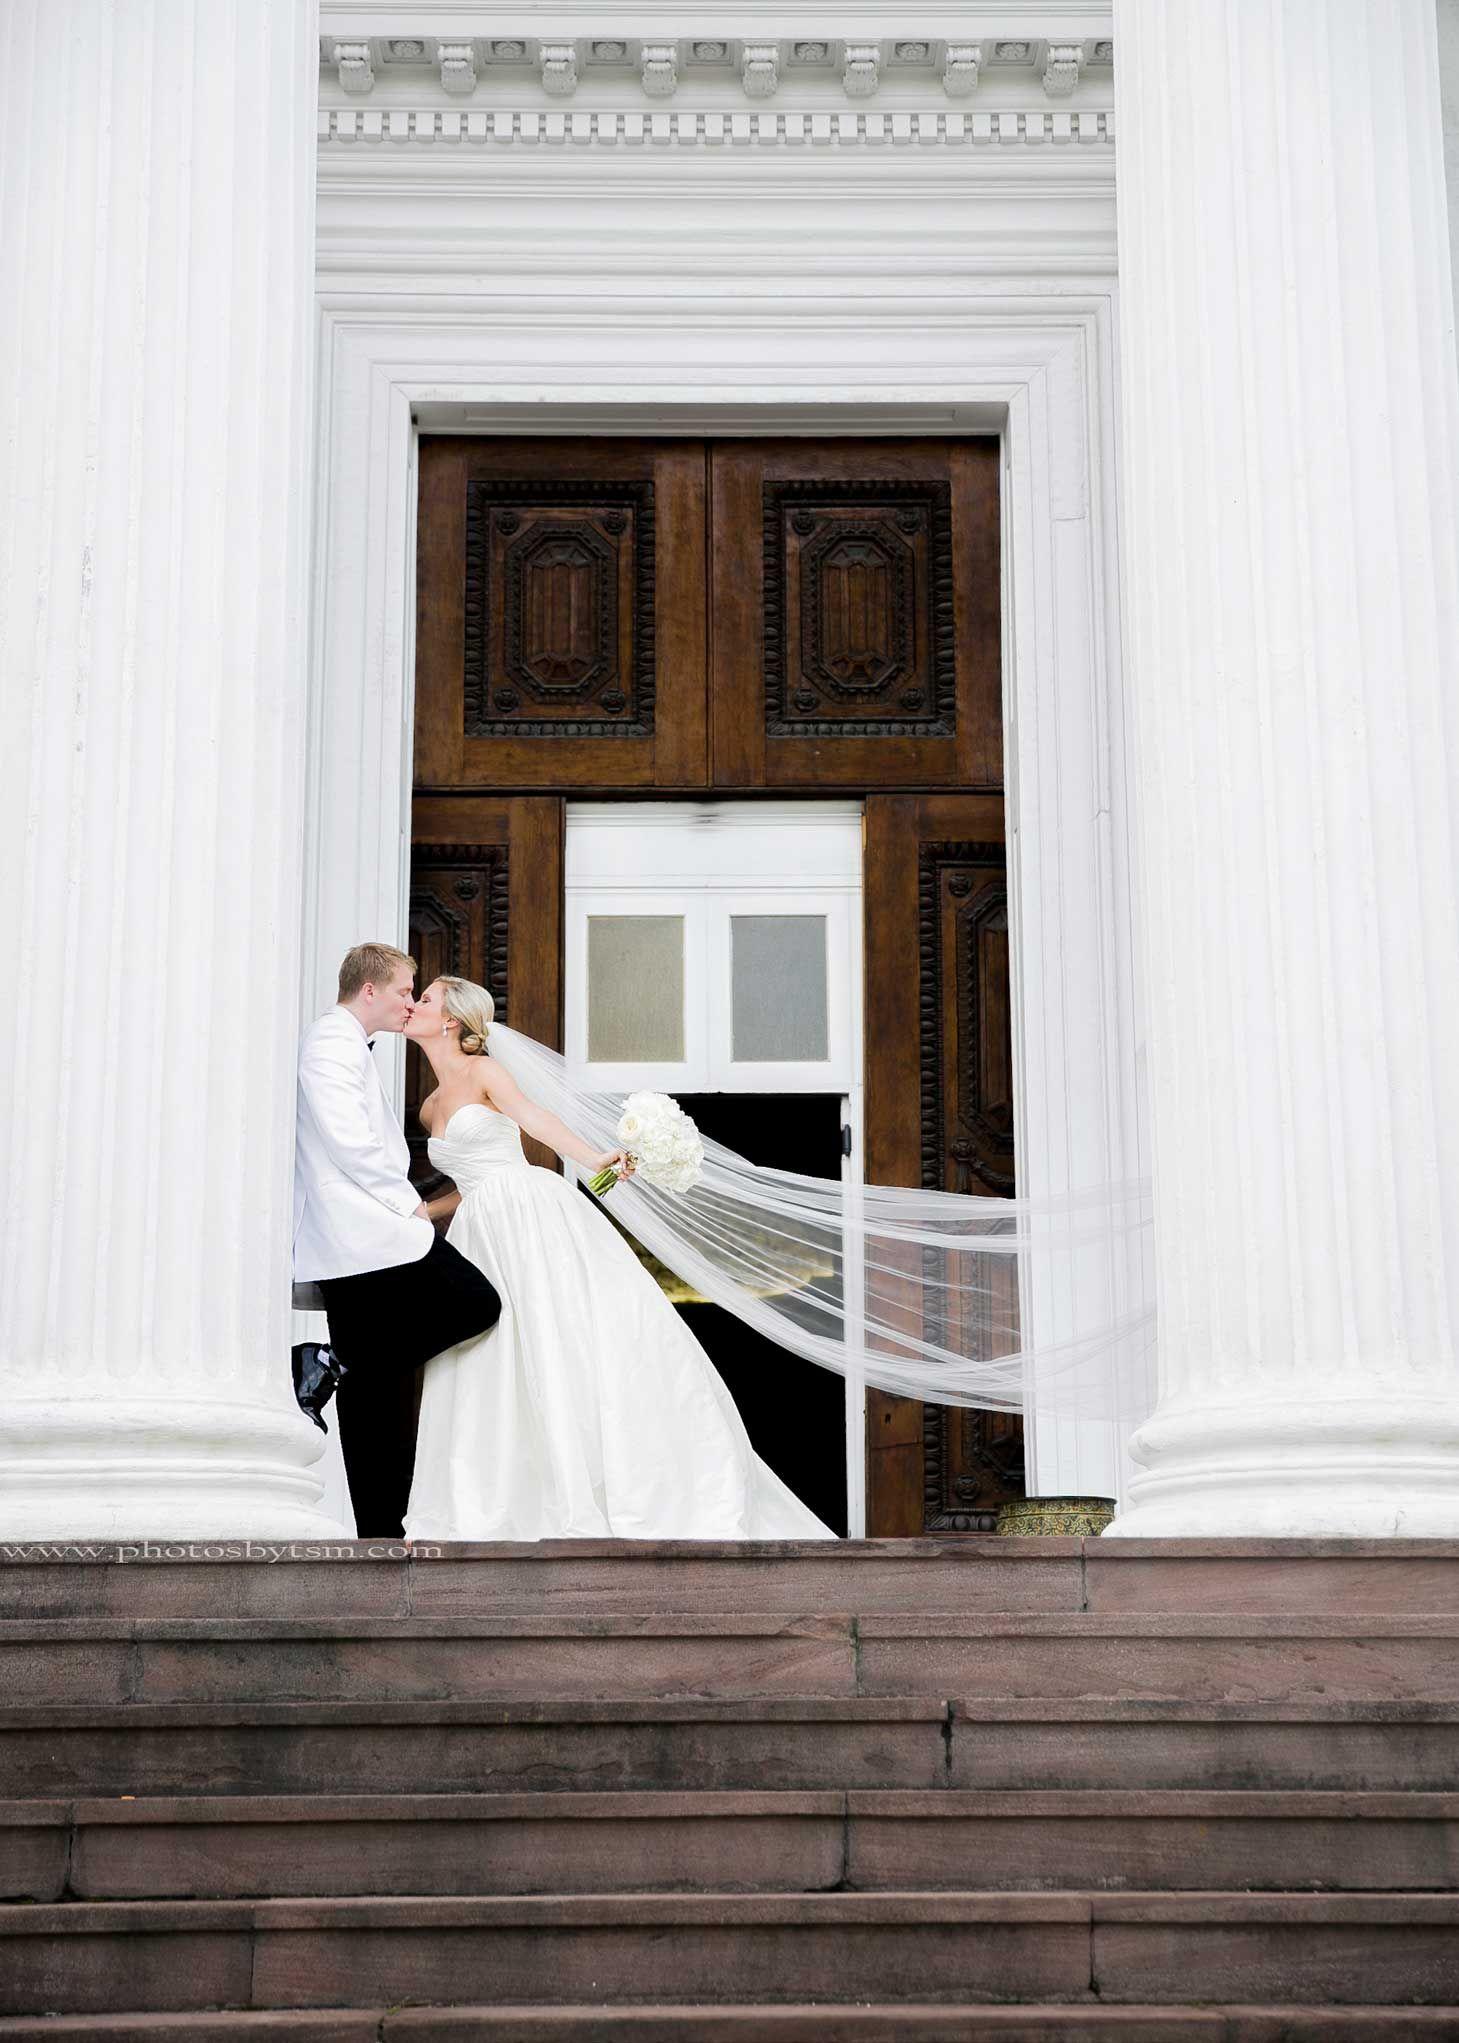 Wedding Rings, Photography By TSM, Wedding Photography